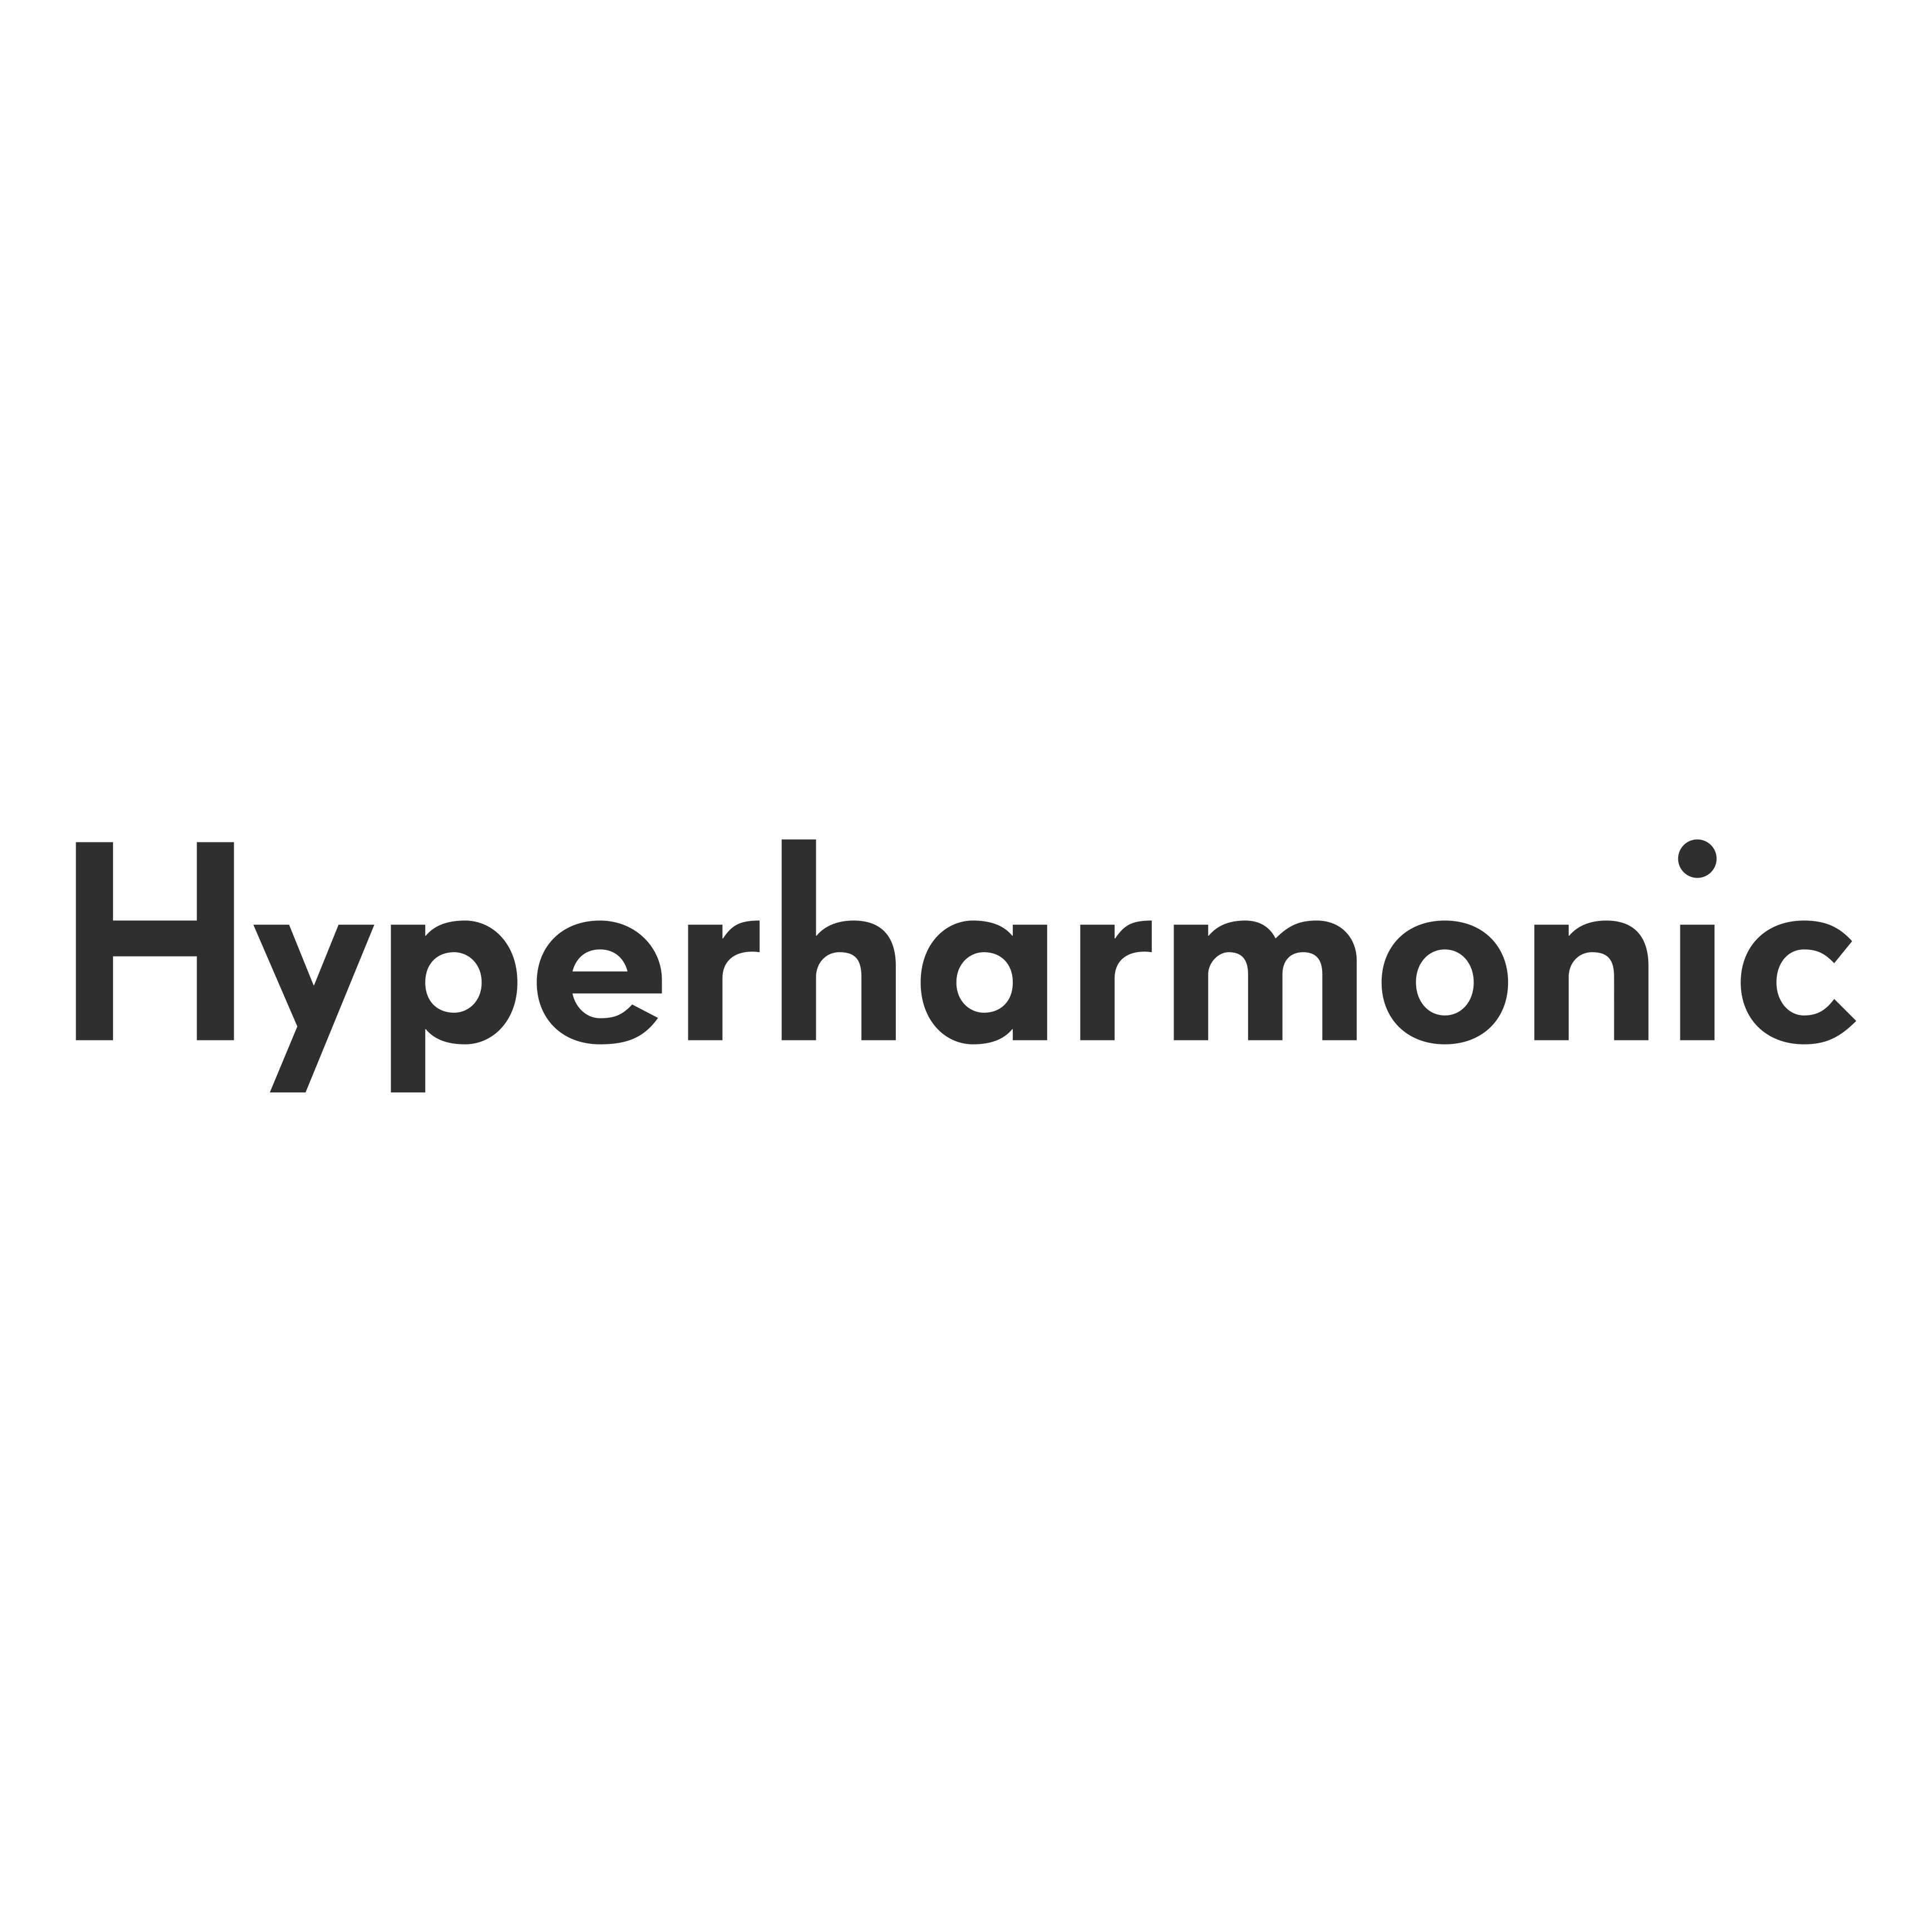 Hyperharmonic